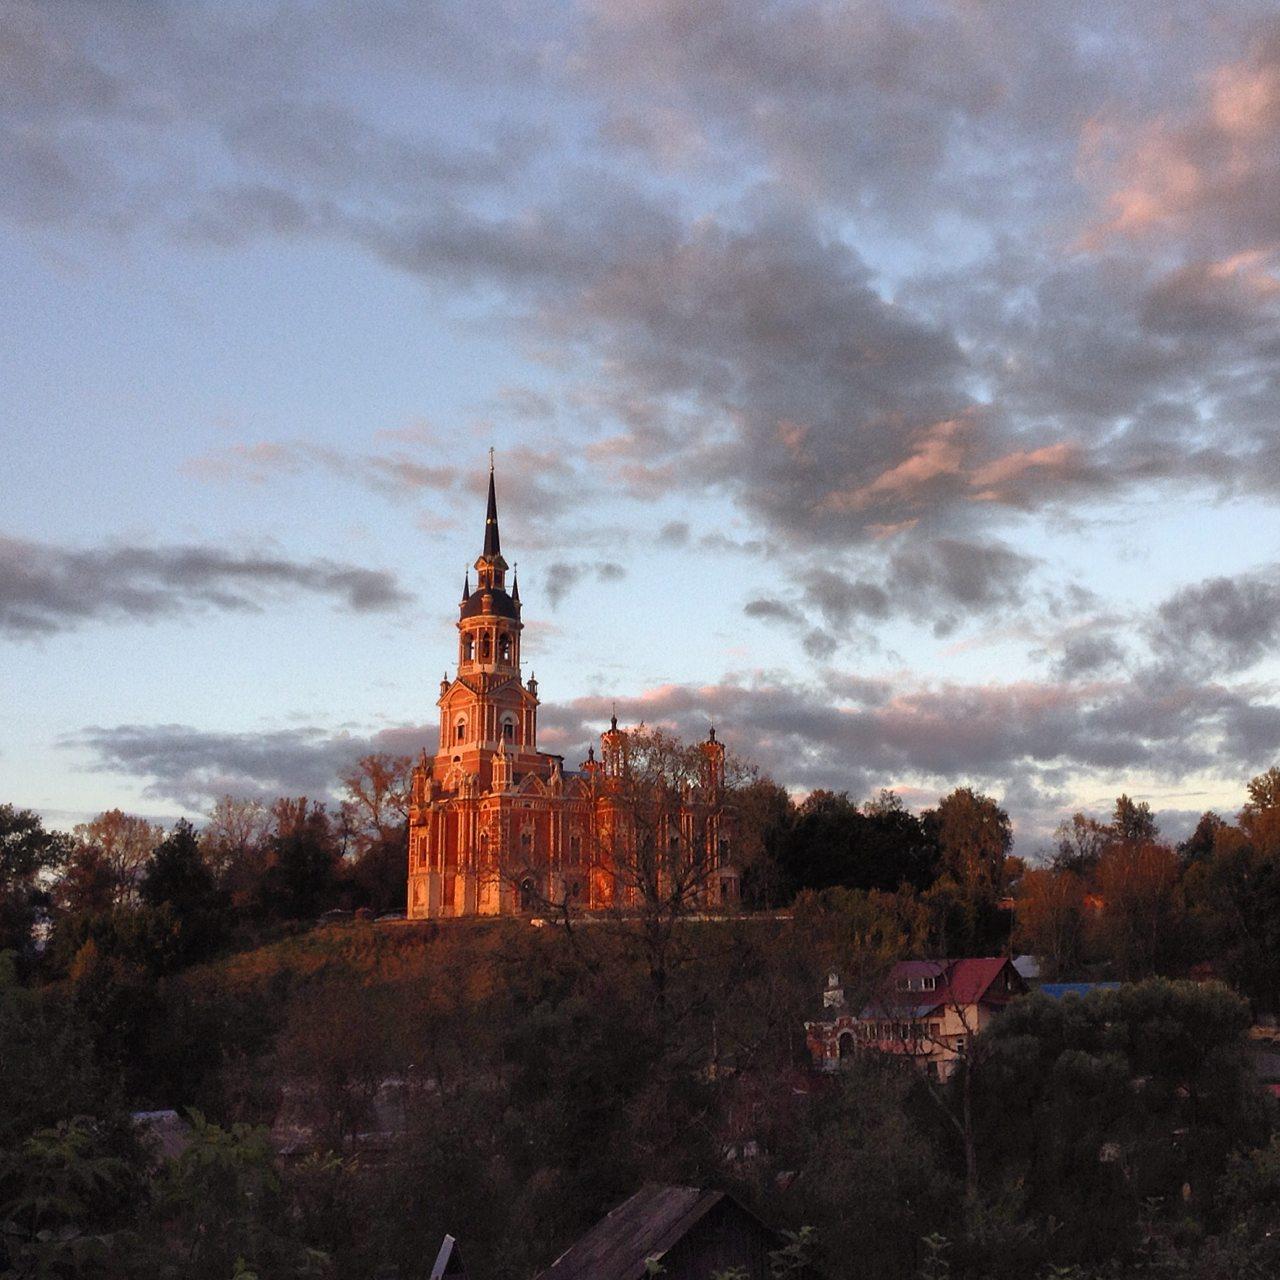 Закат в Можайске. Фото Павла Гнилорыбова